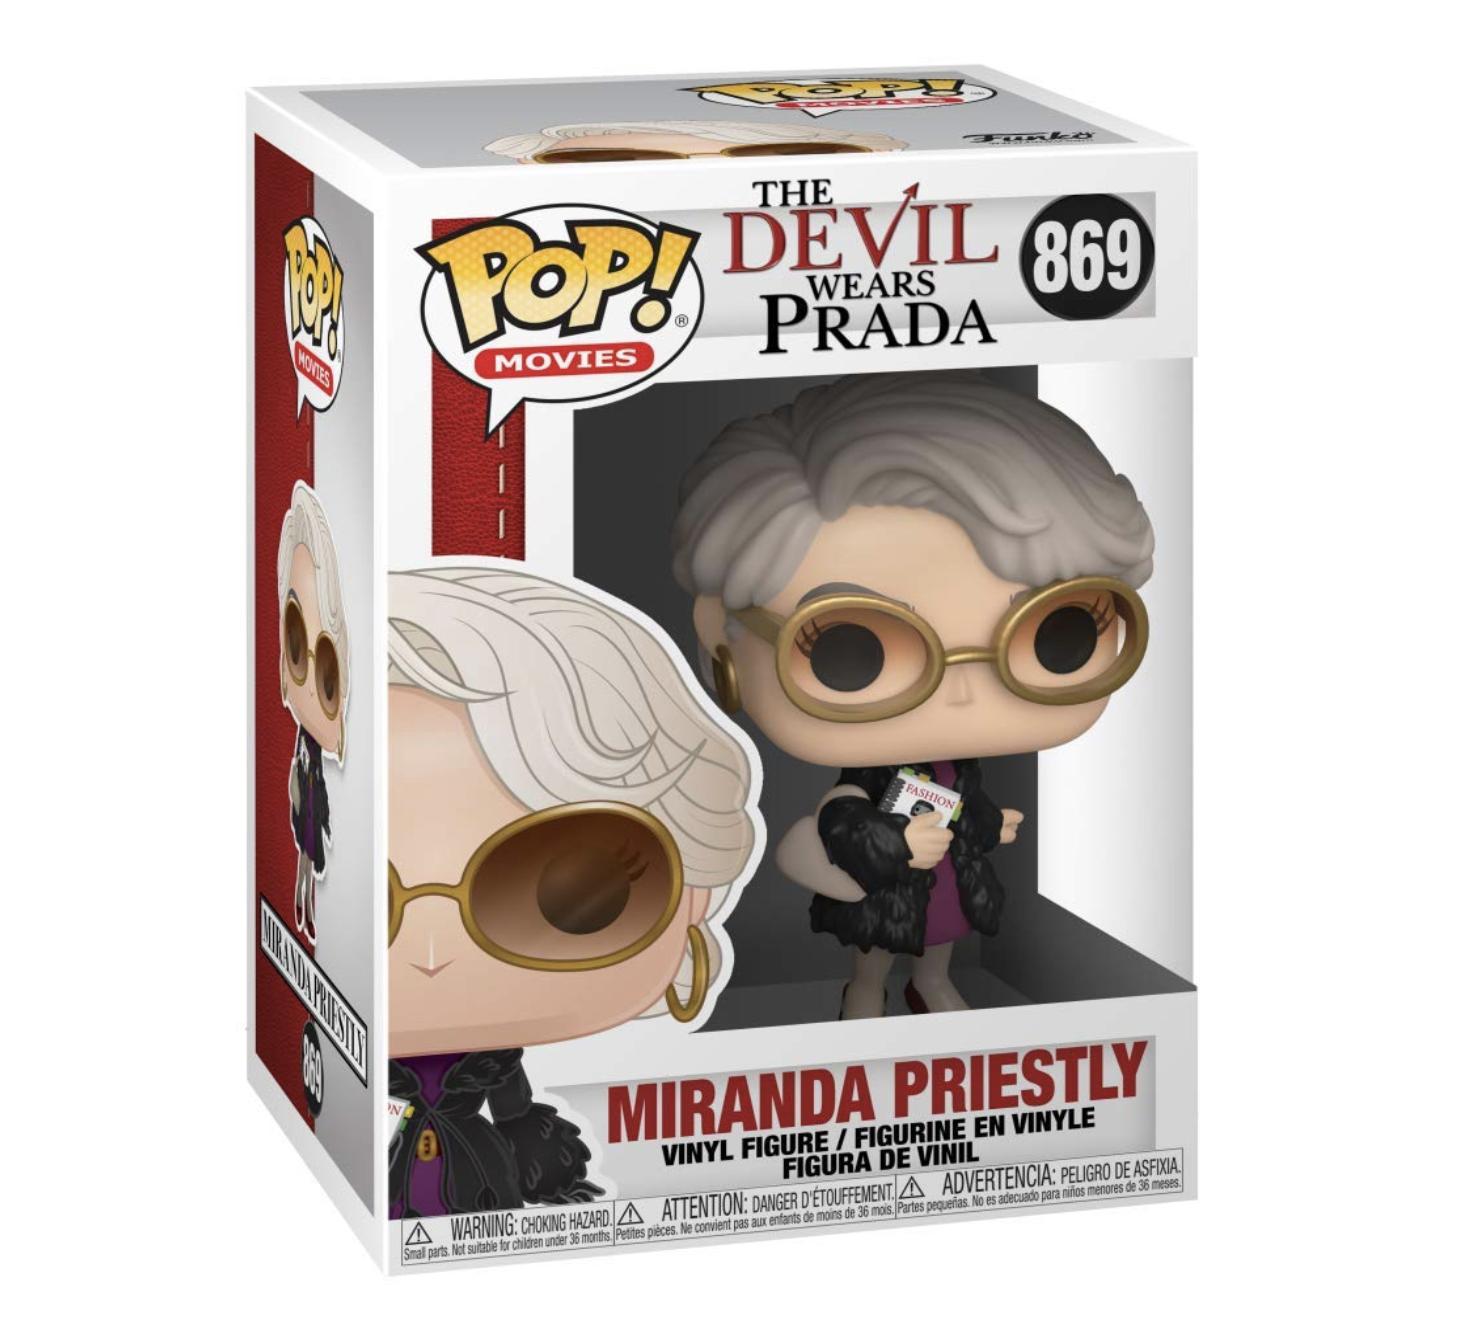 Funko Pop! Movies: The Devil Wears Prada, Miranda Priestly